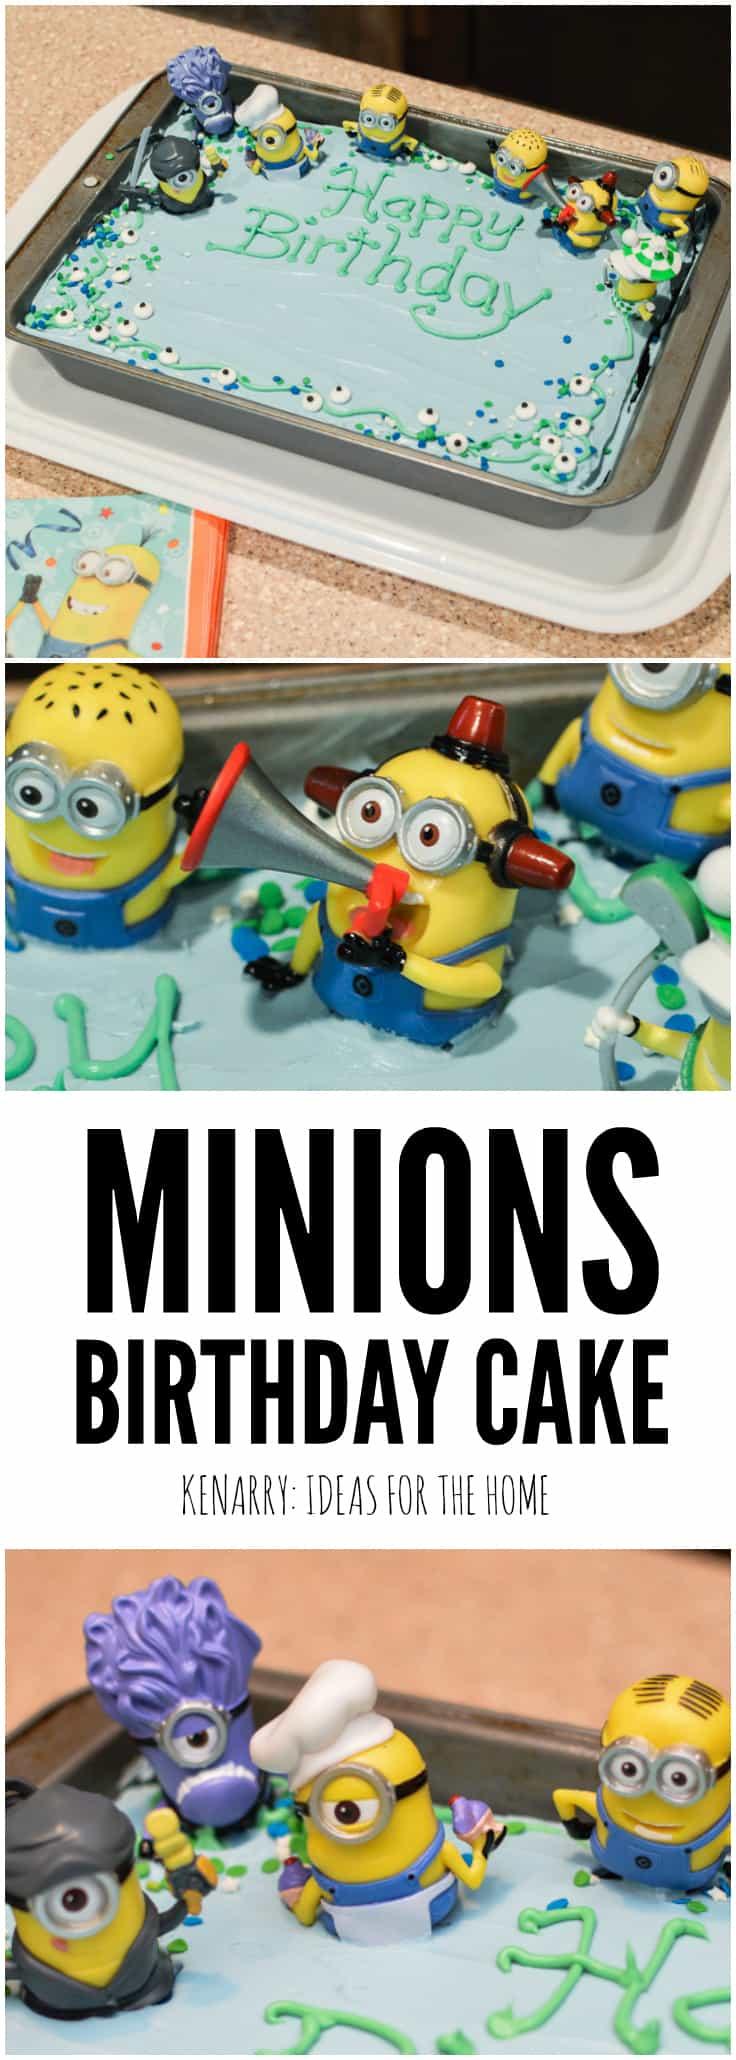 Minions Birthday Cake An Easy Despicable Me Party Idea